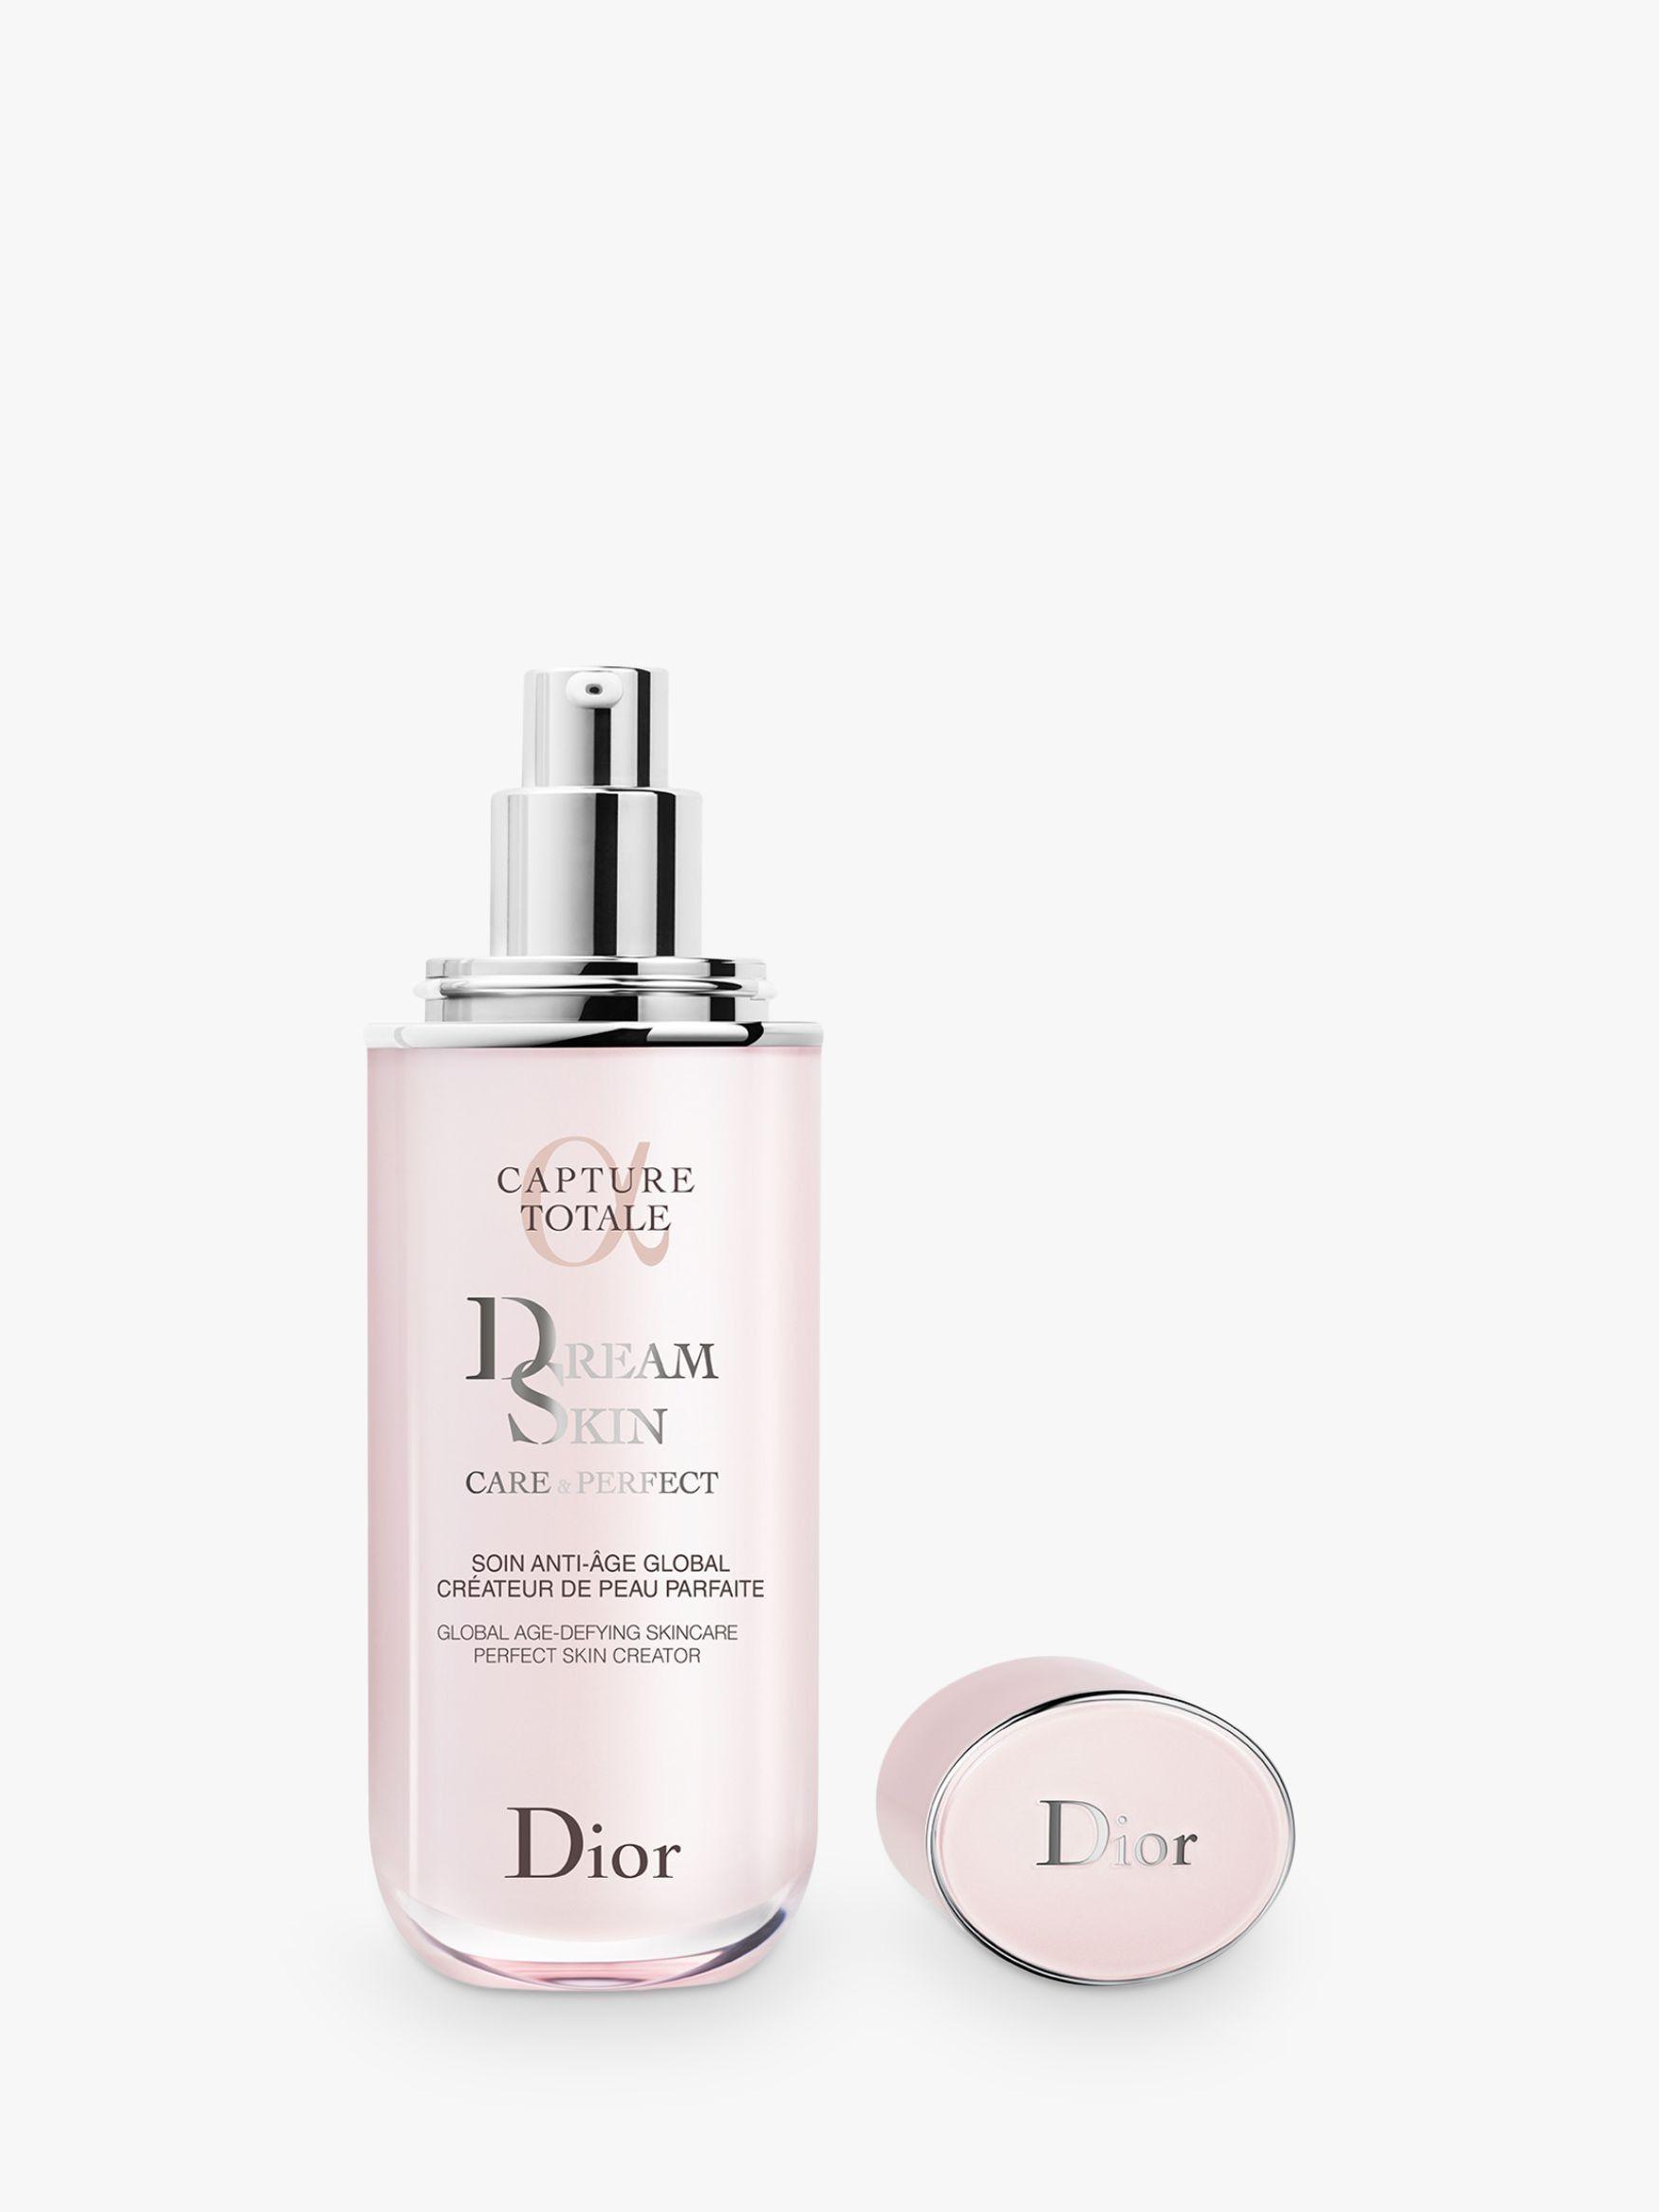 Dior Capture Dreamskin Care Perfect Global Age Defying Skincare Perfect Skin Creator Skincare Perfect Dior Skincare Perfect Skin